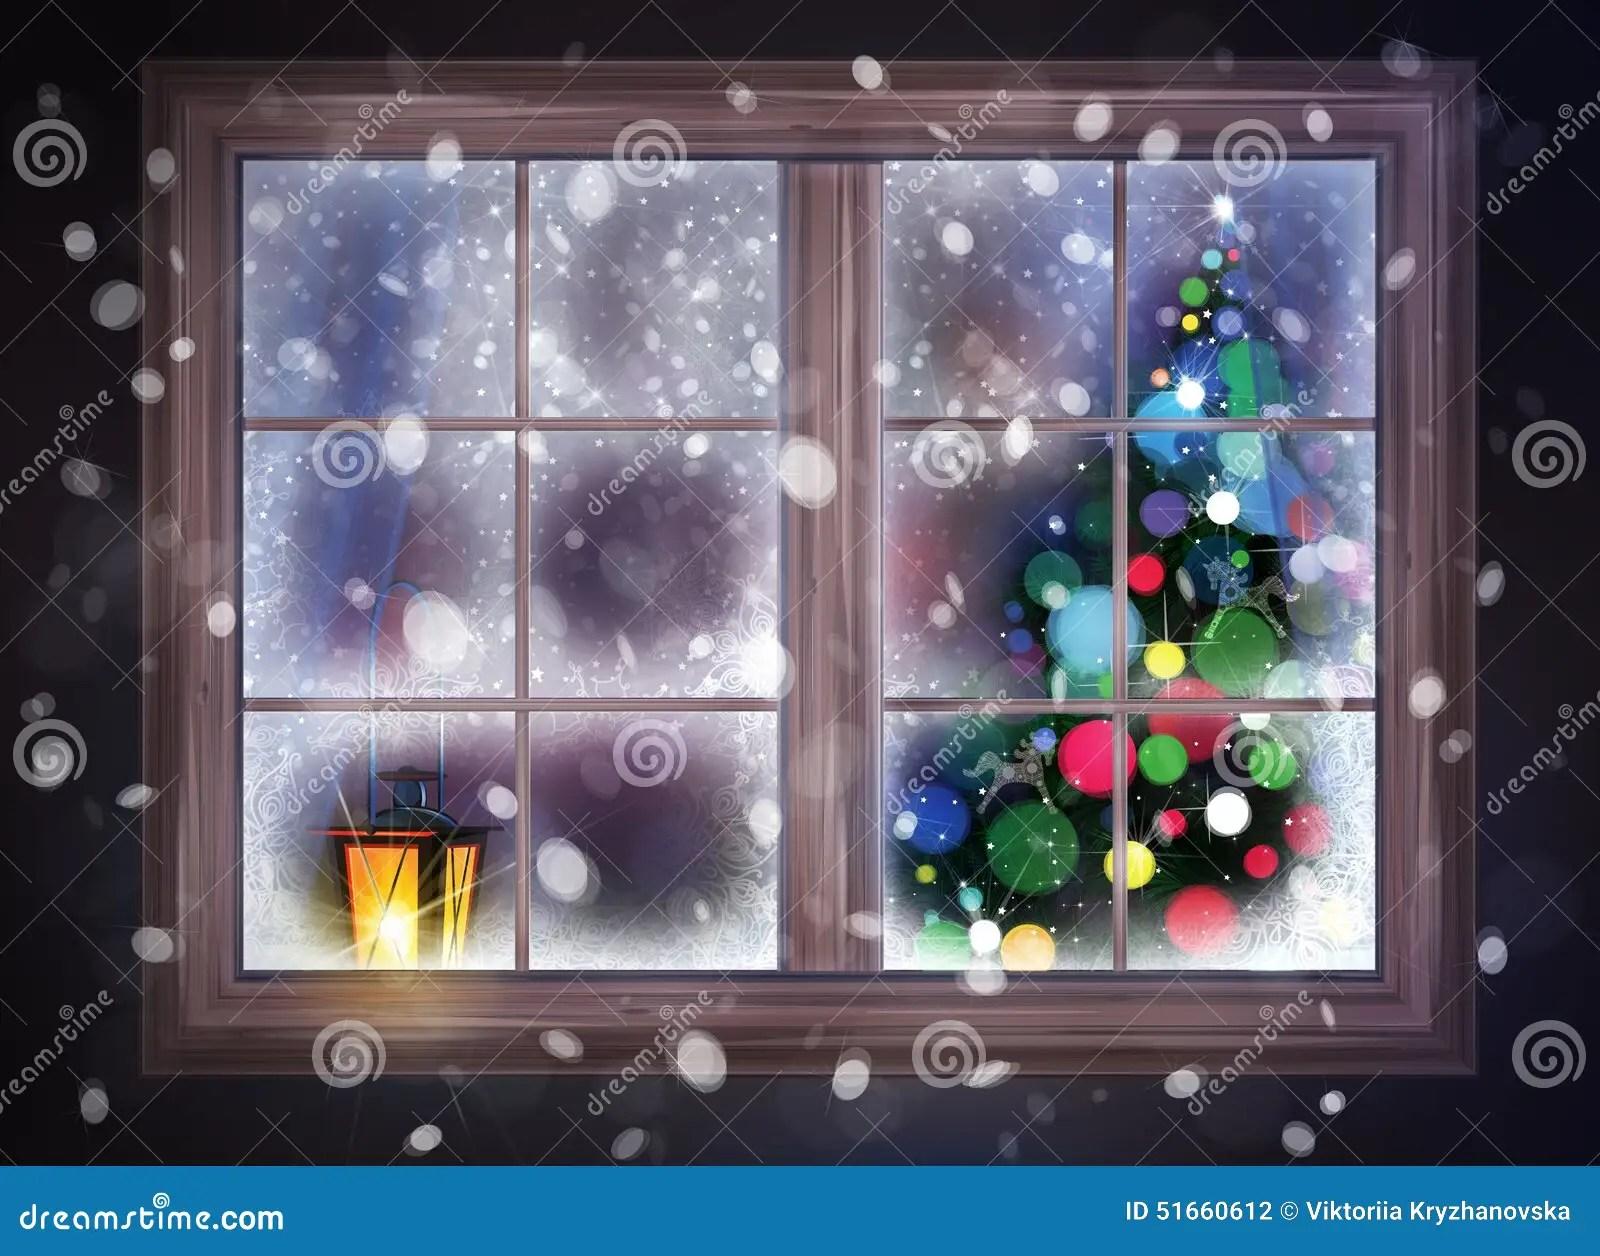 Winter Night Scene Of Window With Christmas Tree And